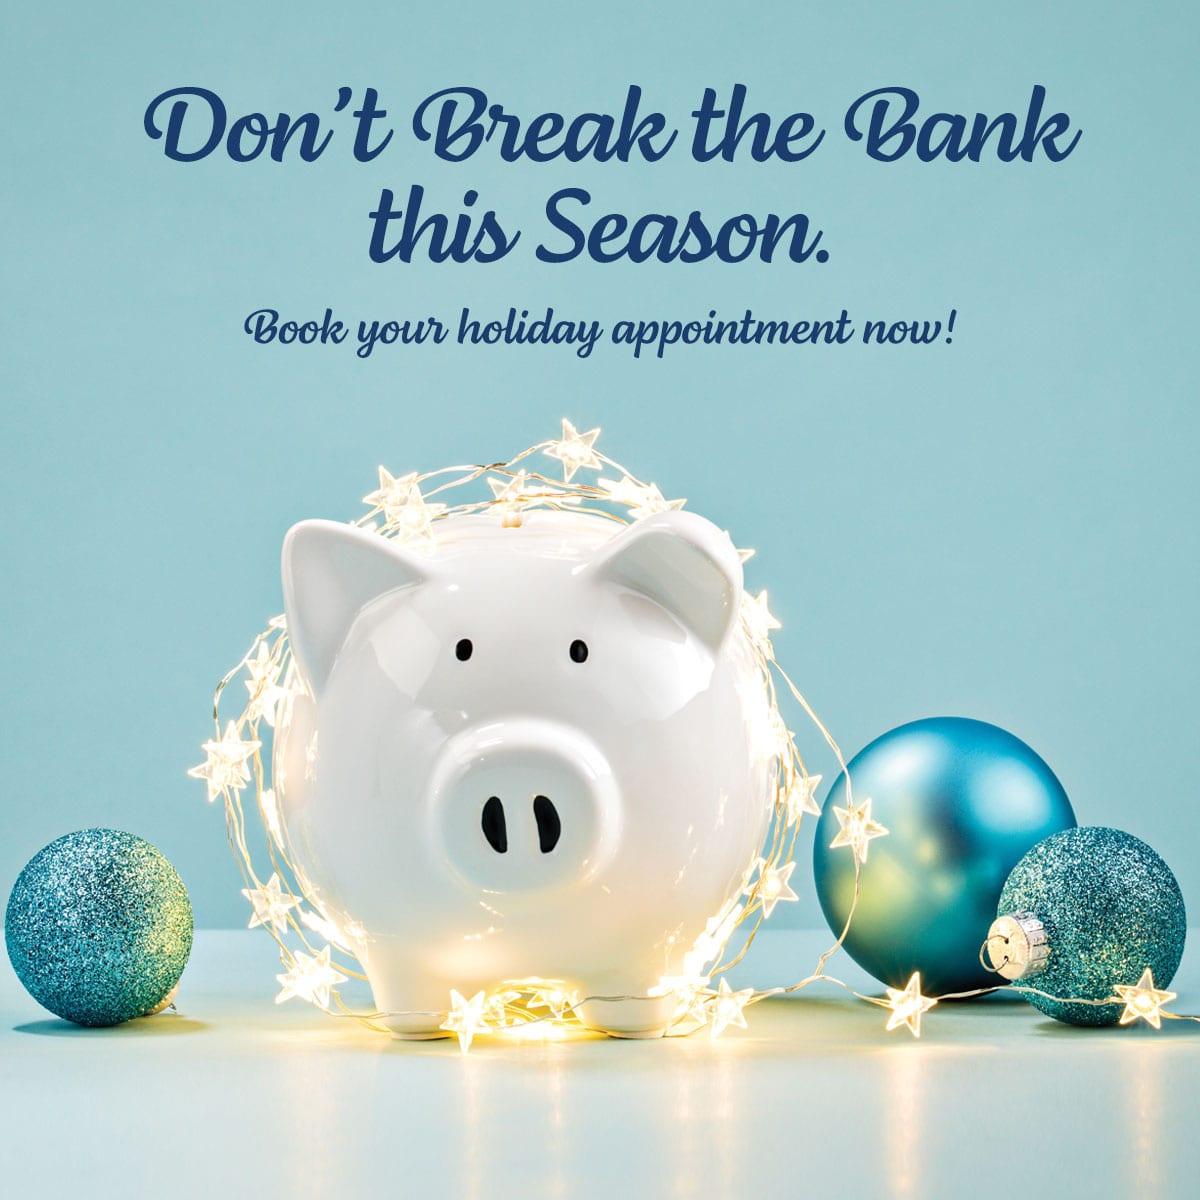 Don't Break the Bank this Season.